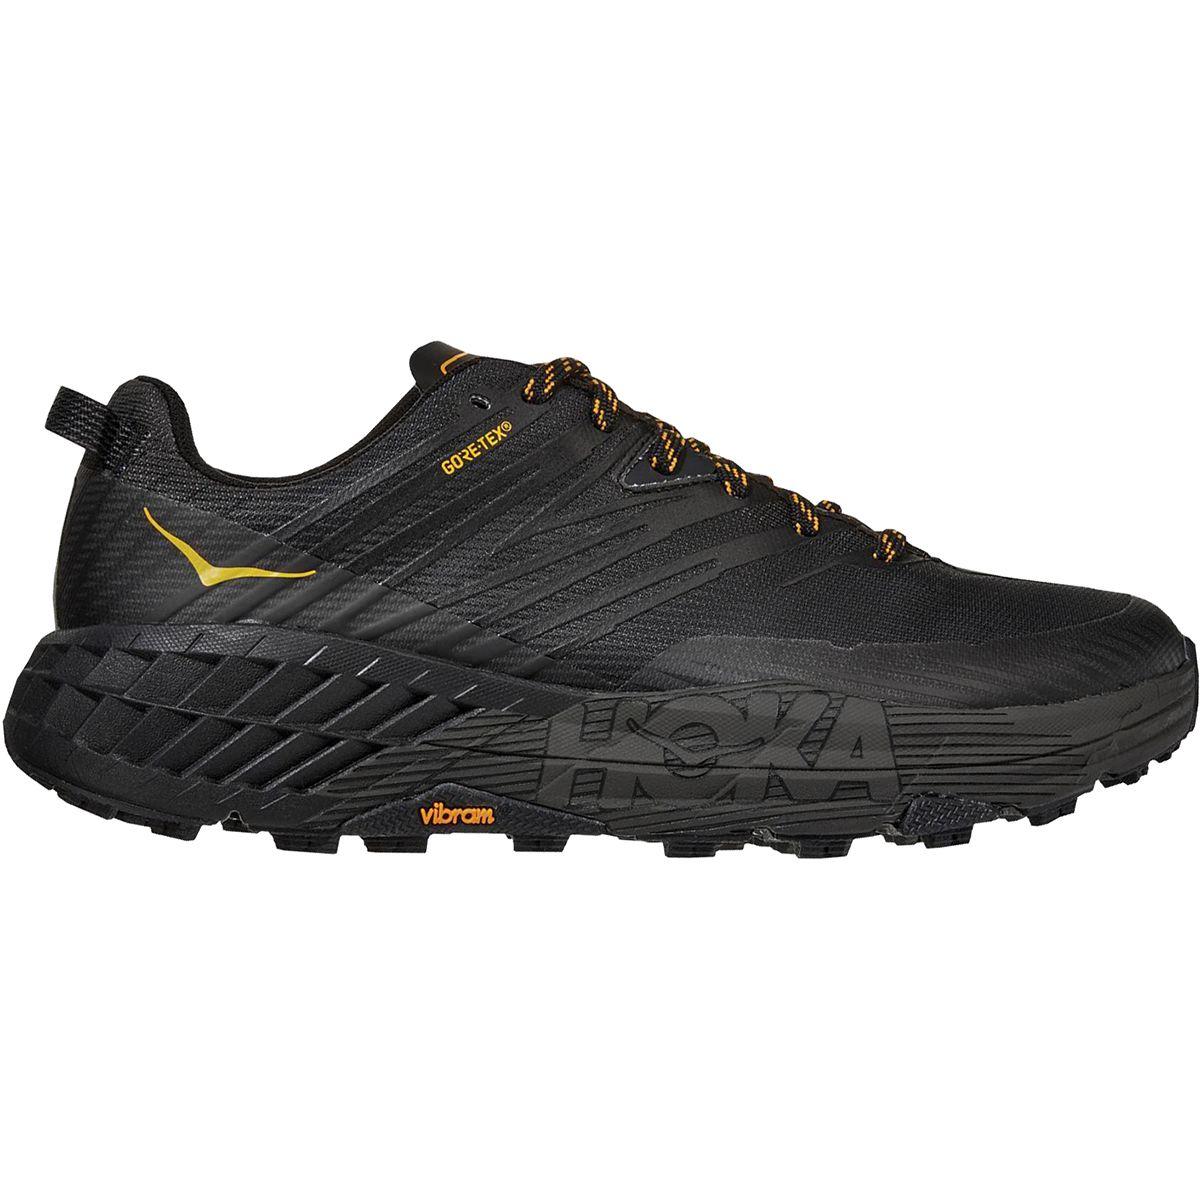 ONE Speedgoat 4 GTX Trail Running Shoe